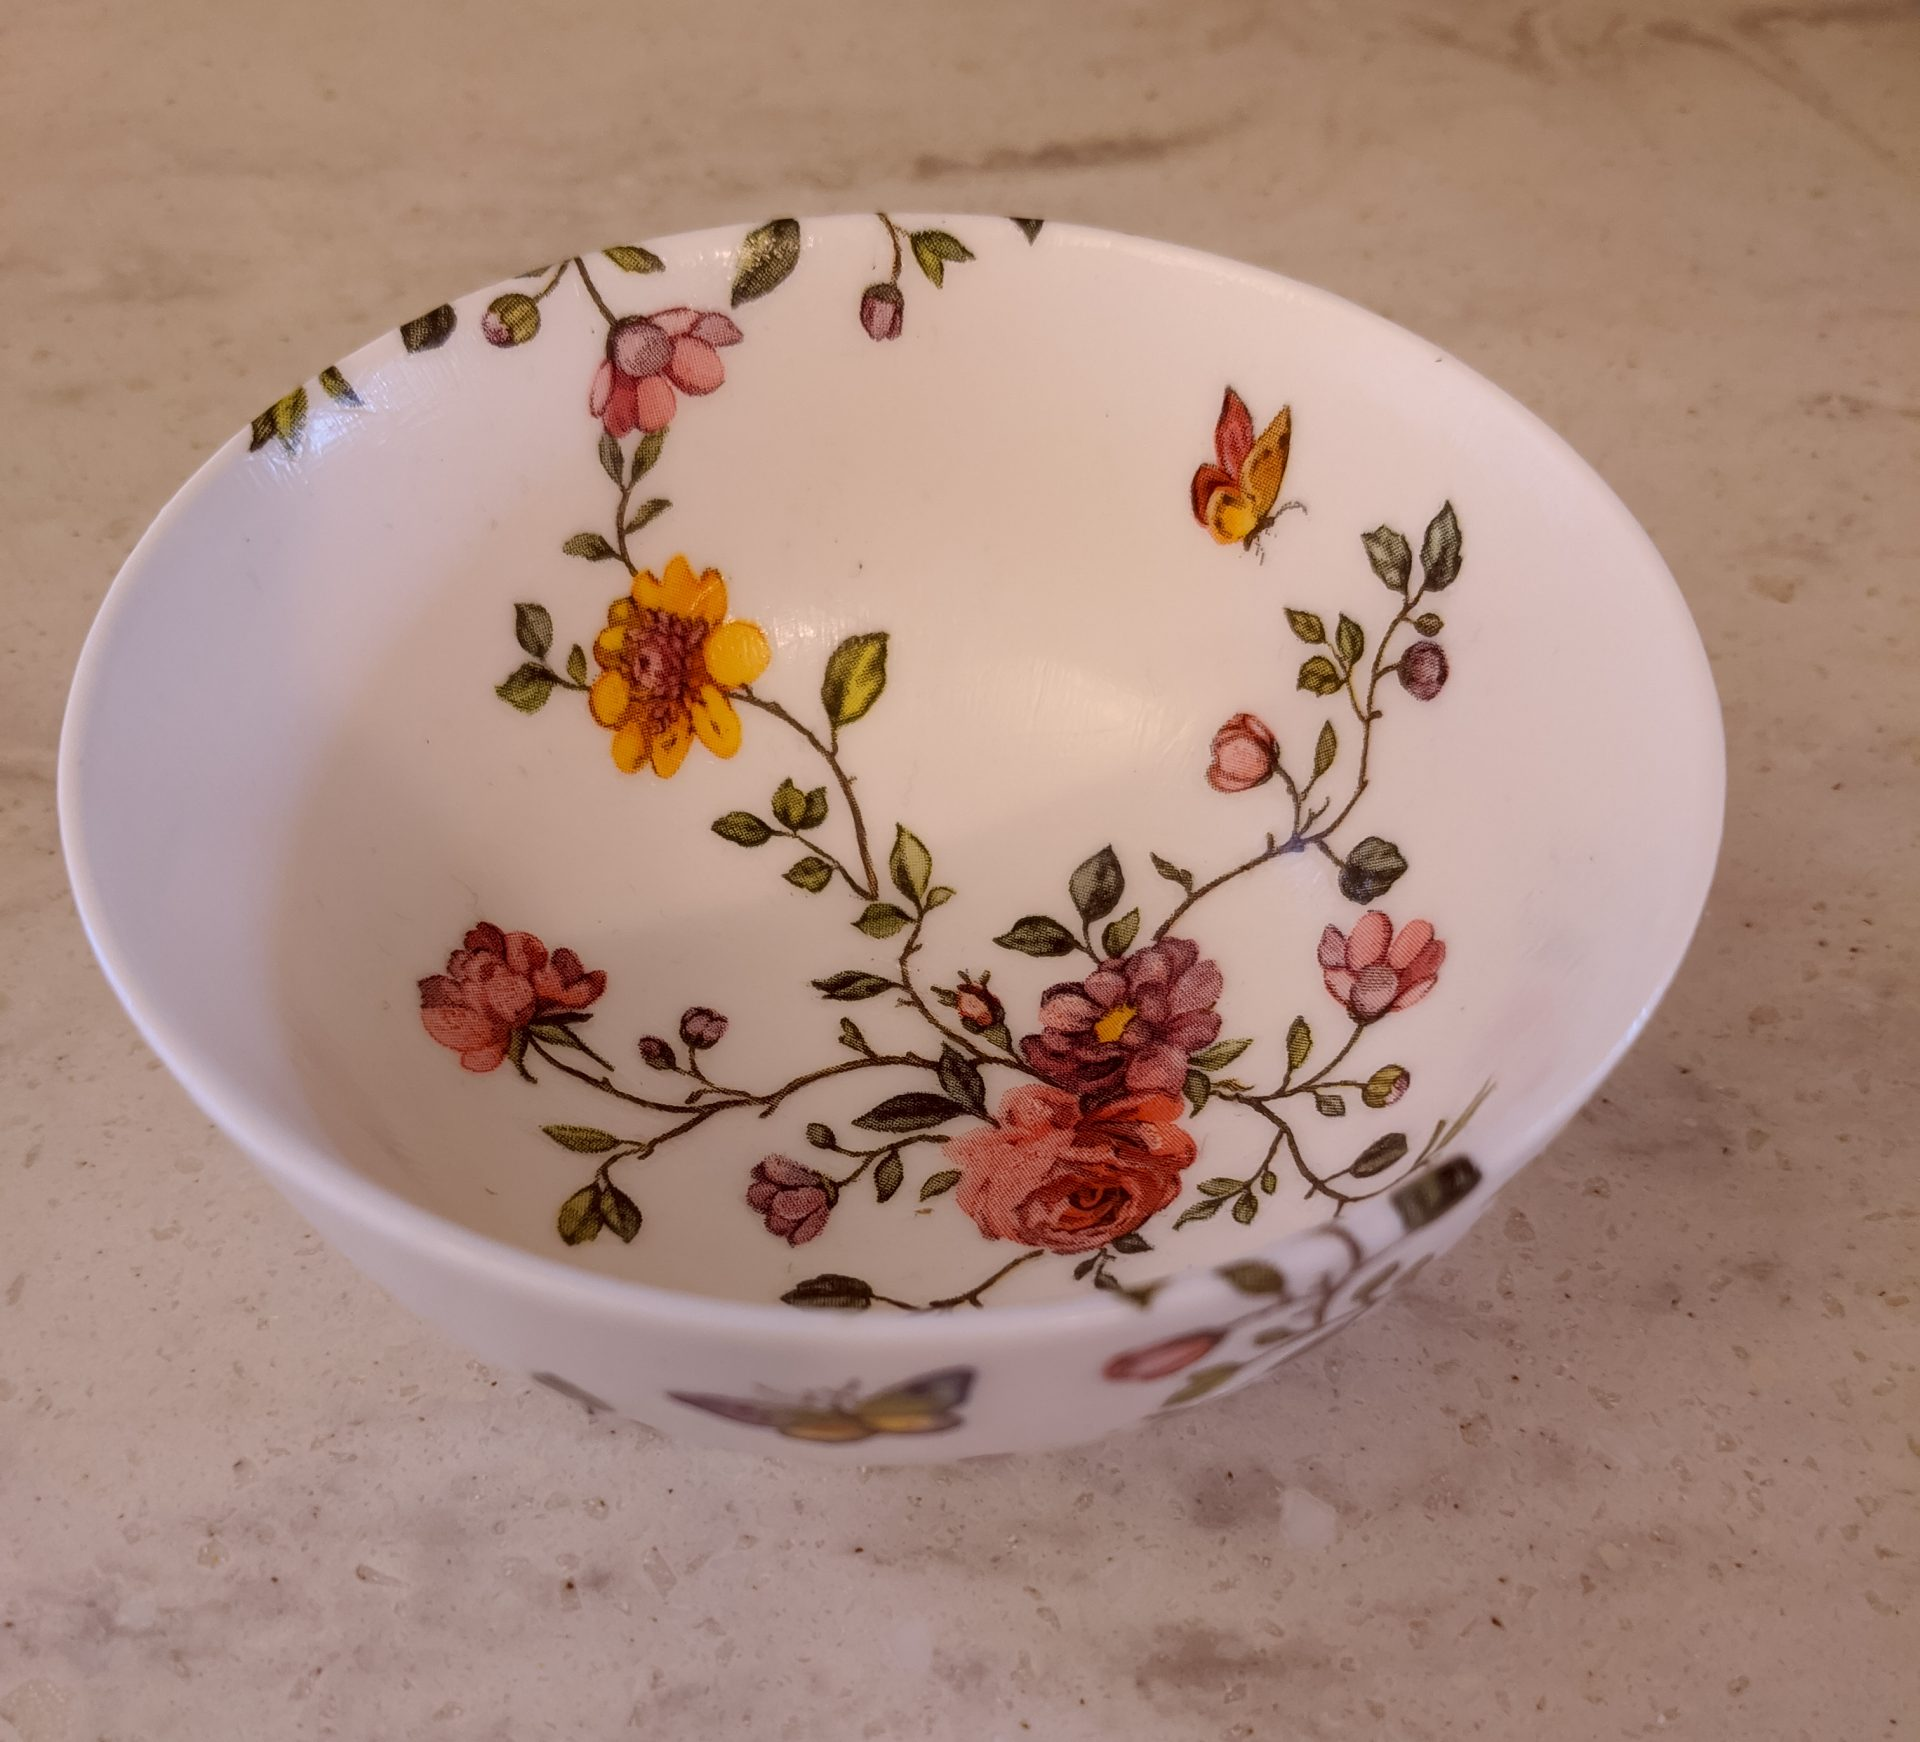 DIY Porcelain Bowl Modge Podge with Napkins themamavillage.com